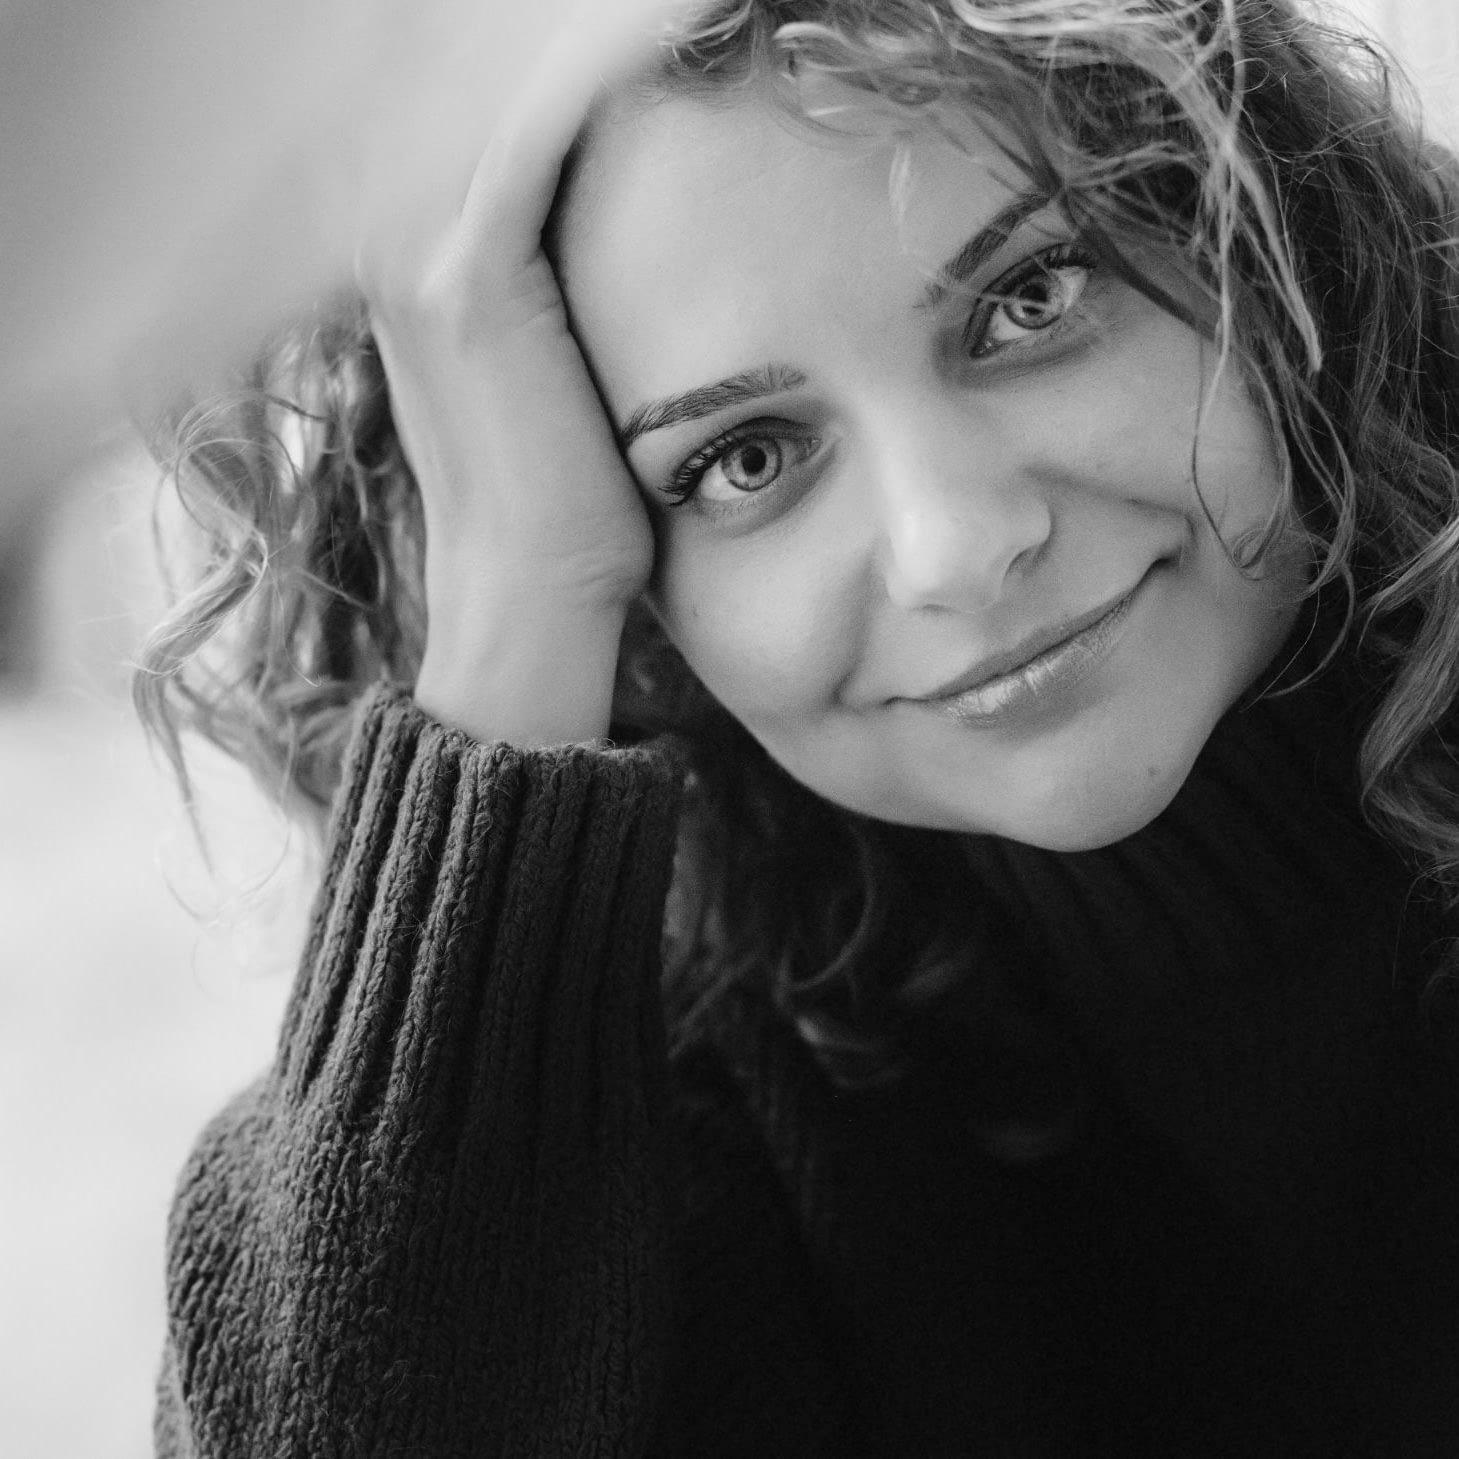 alina-botica-fotograf-portret-irina-bescuca-rawyou-23